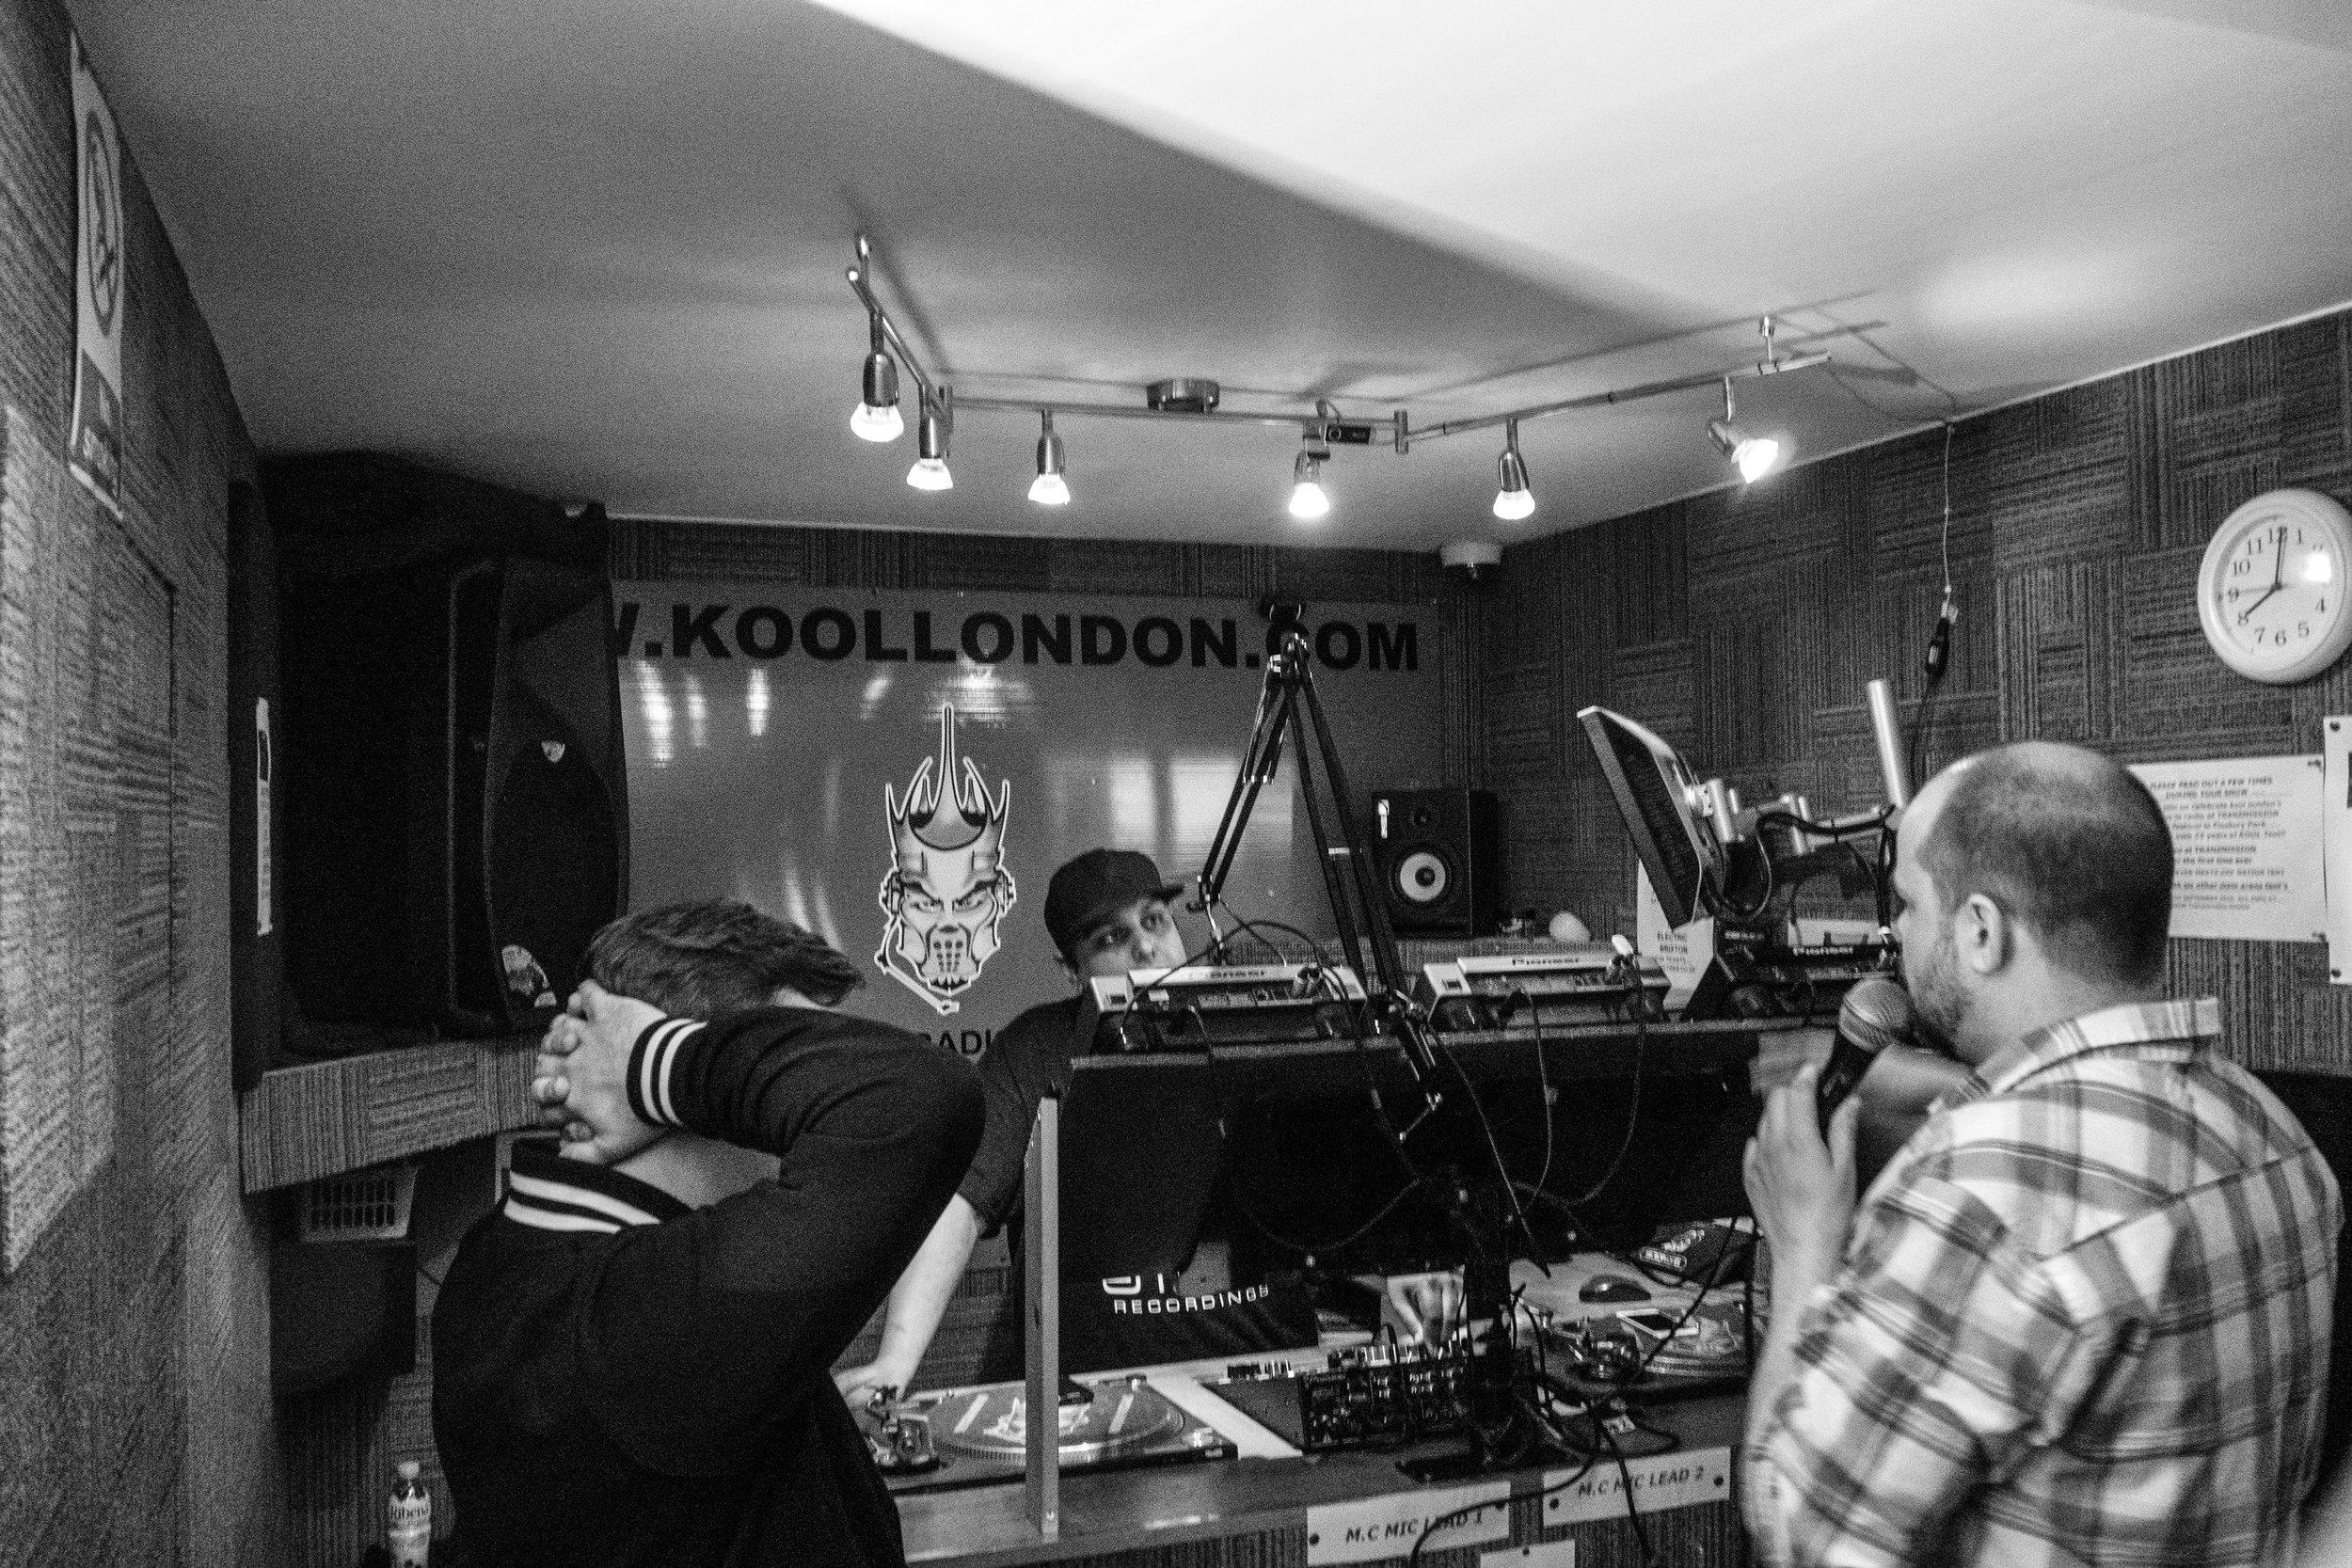 Peter Costigan and Eric Tesainer being interviewed on Kool London